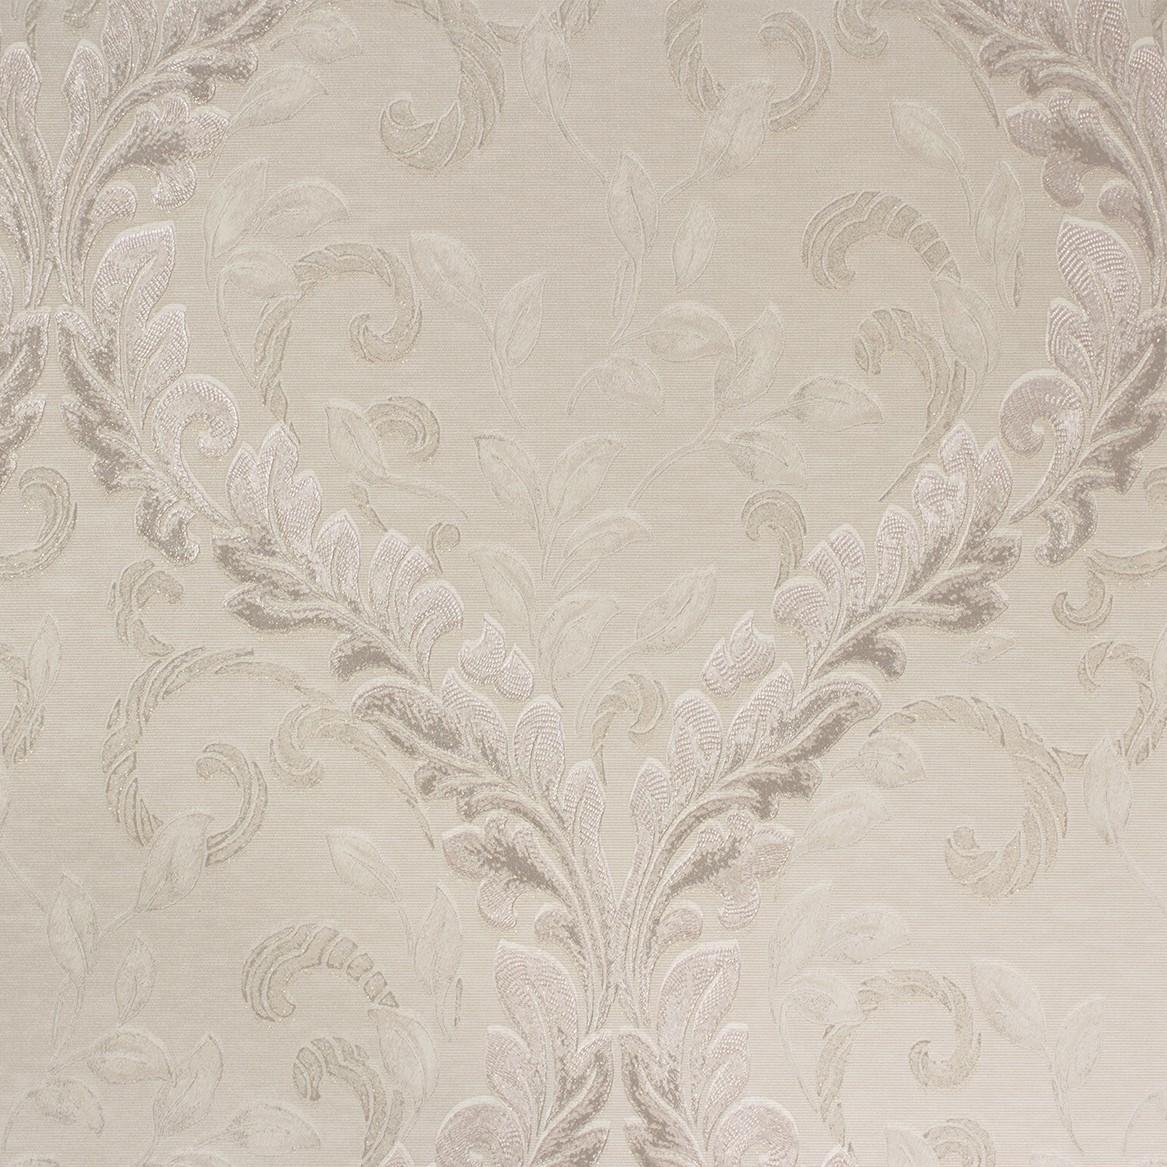 Barock Tapete Auf Leinwand : Tapeten Angelica Barock creme rosa Tapete Rasch Textil 005314